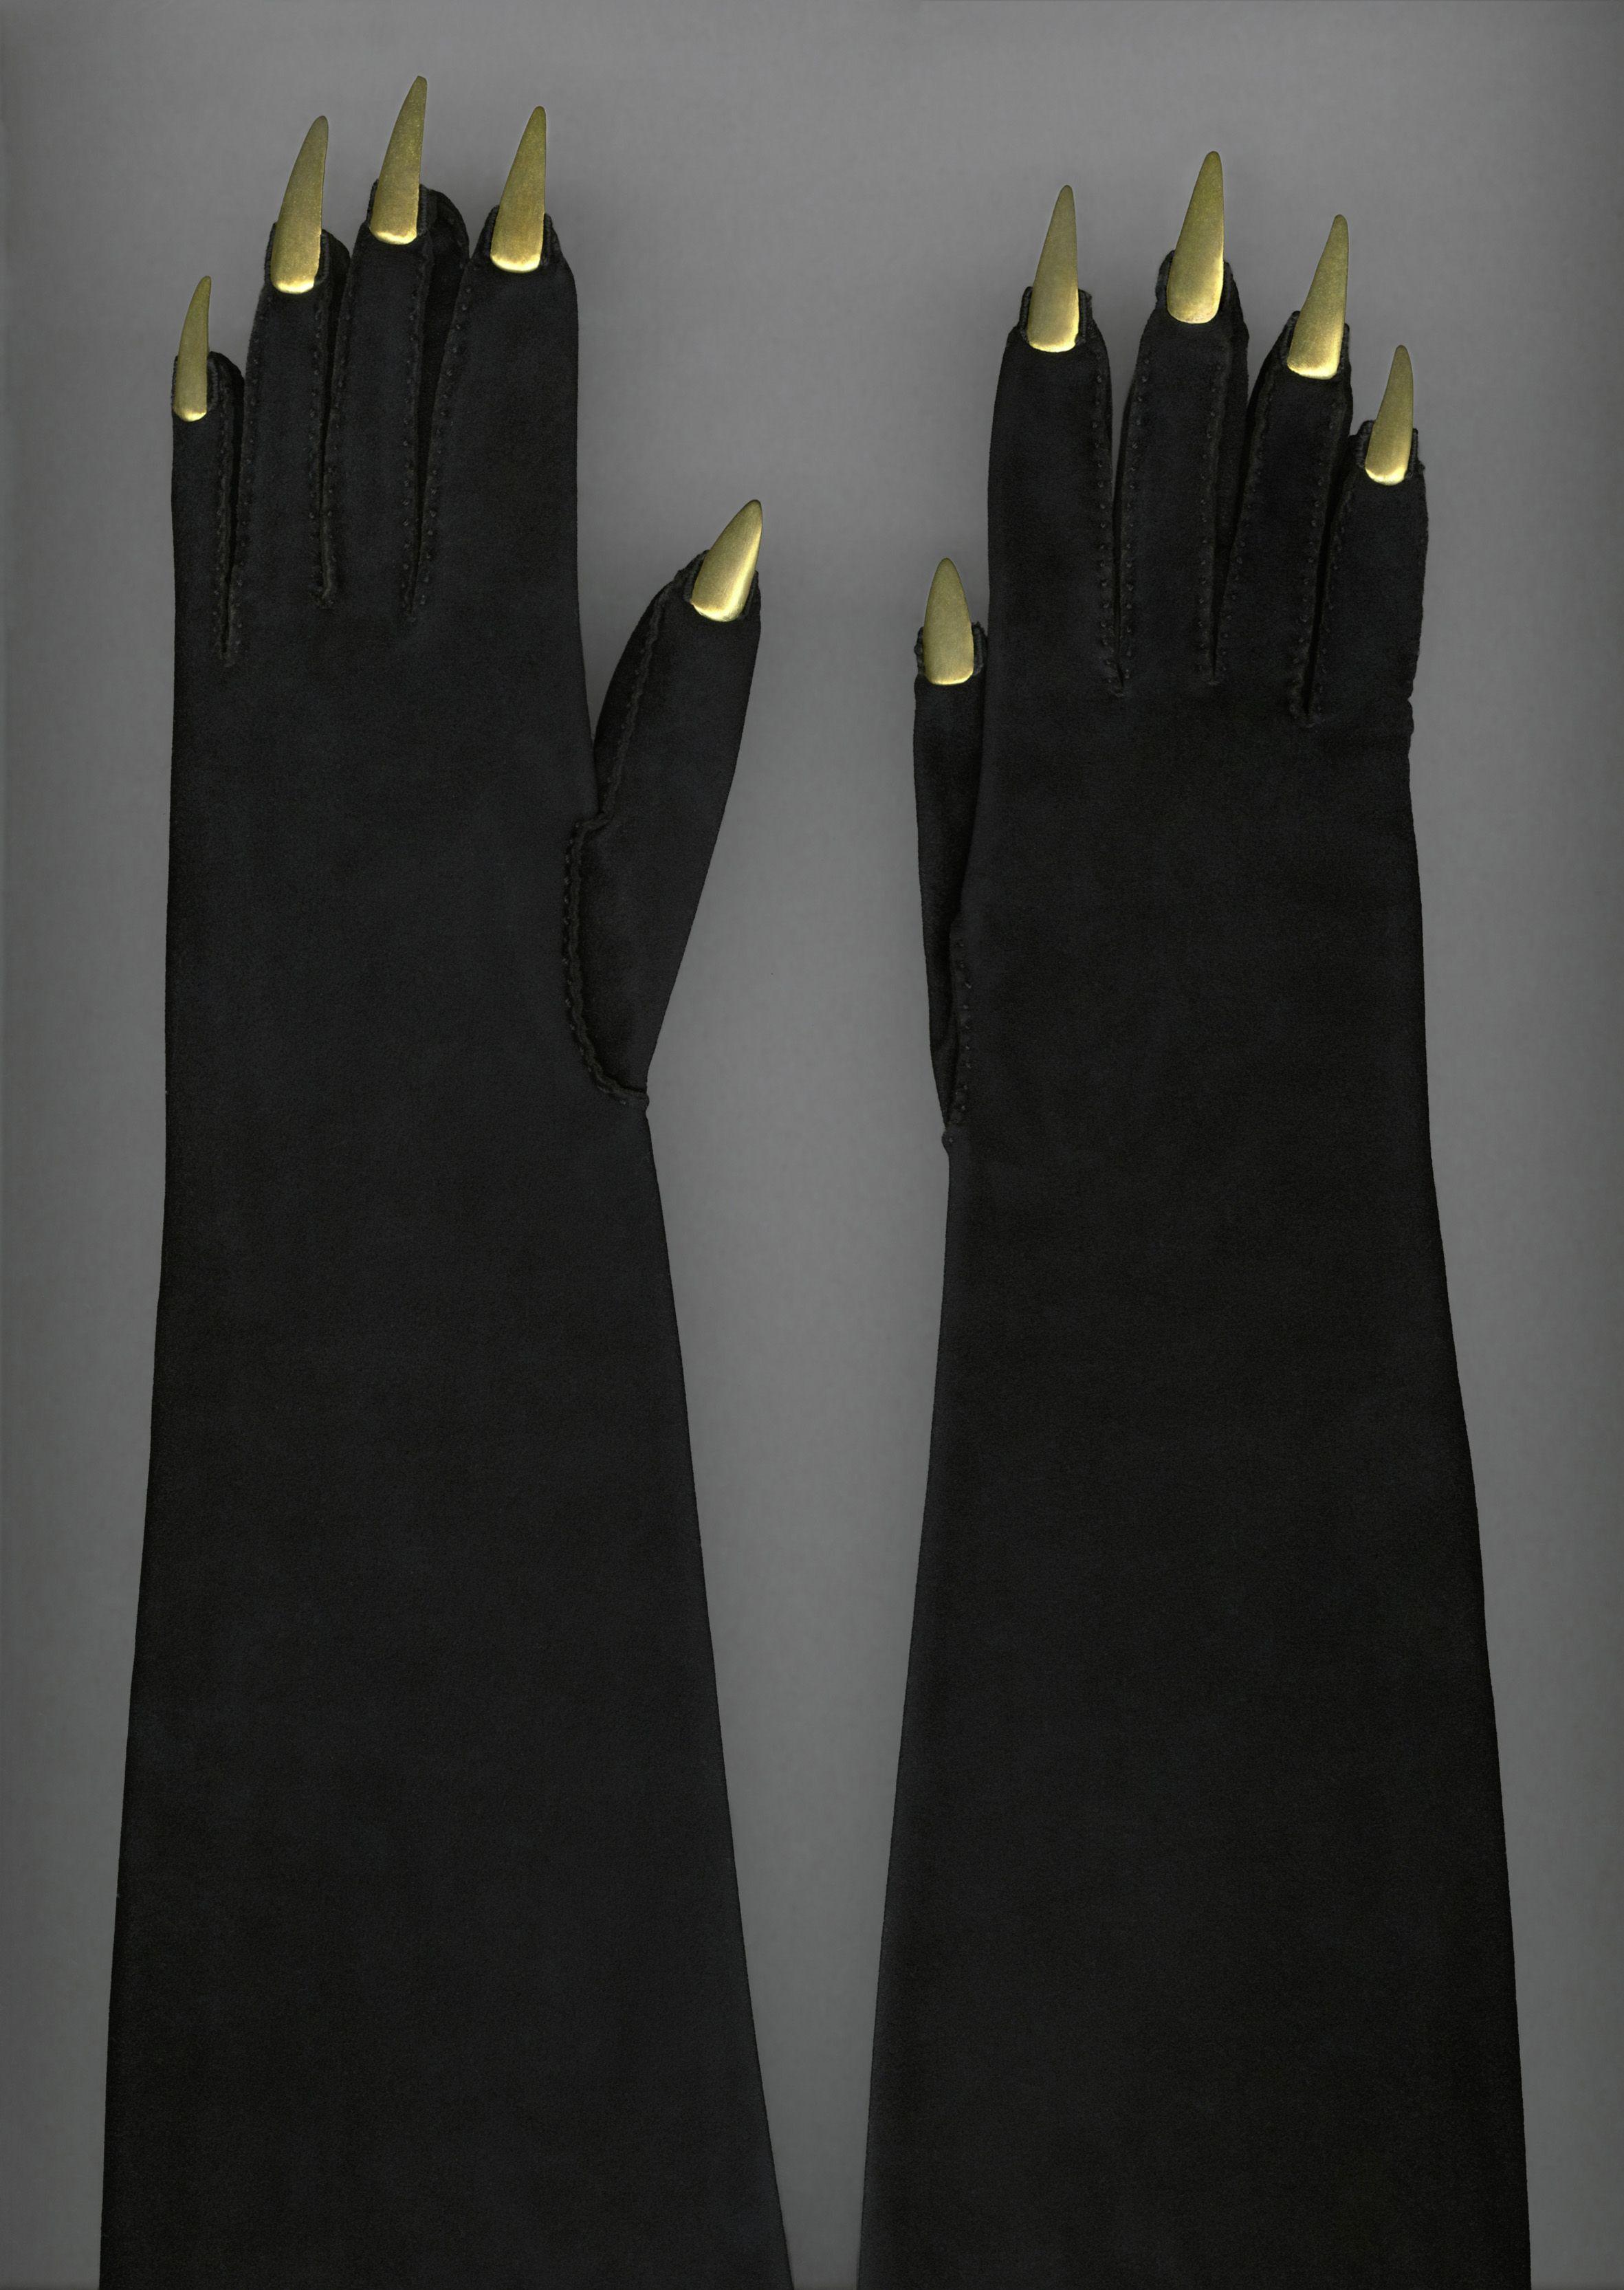 Anais Reboux Nude elsa schiaparelli, evening gloves, 1936 copyright